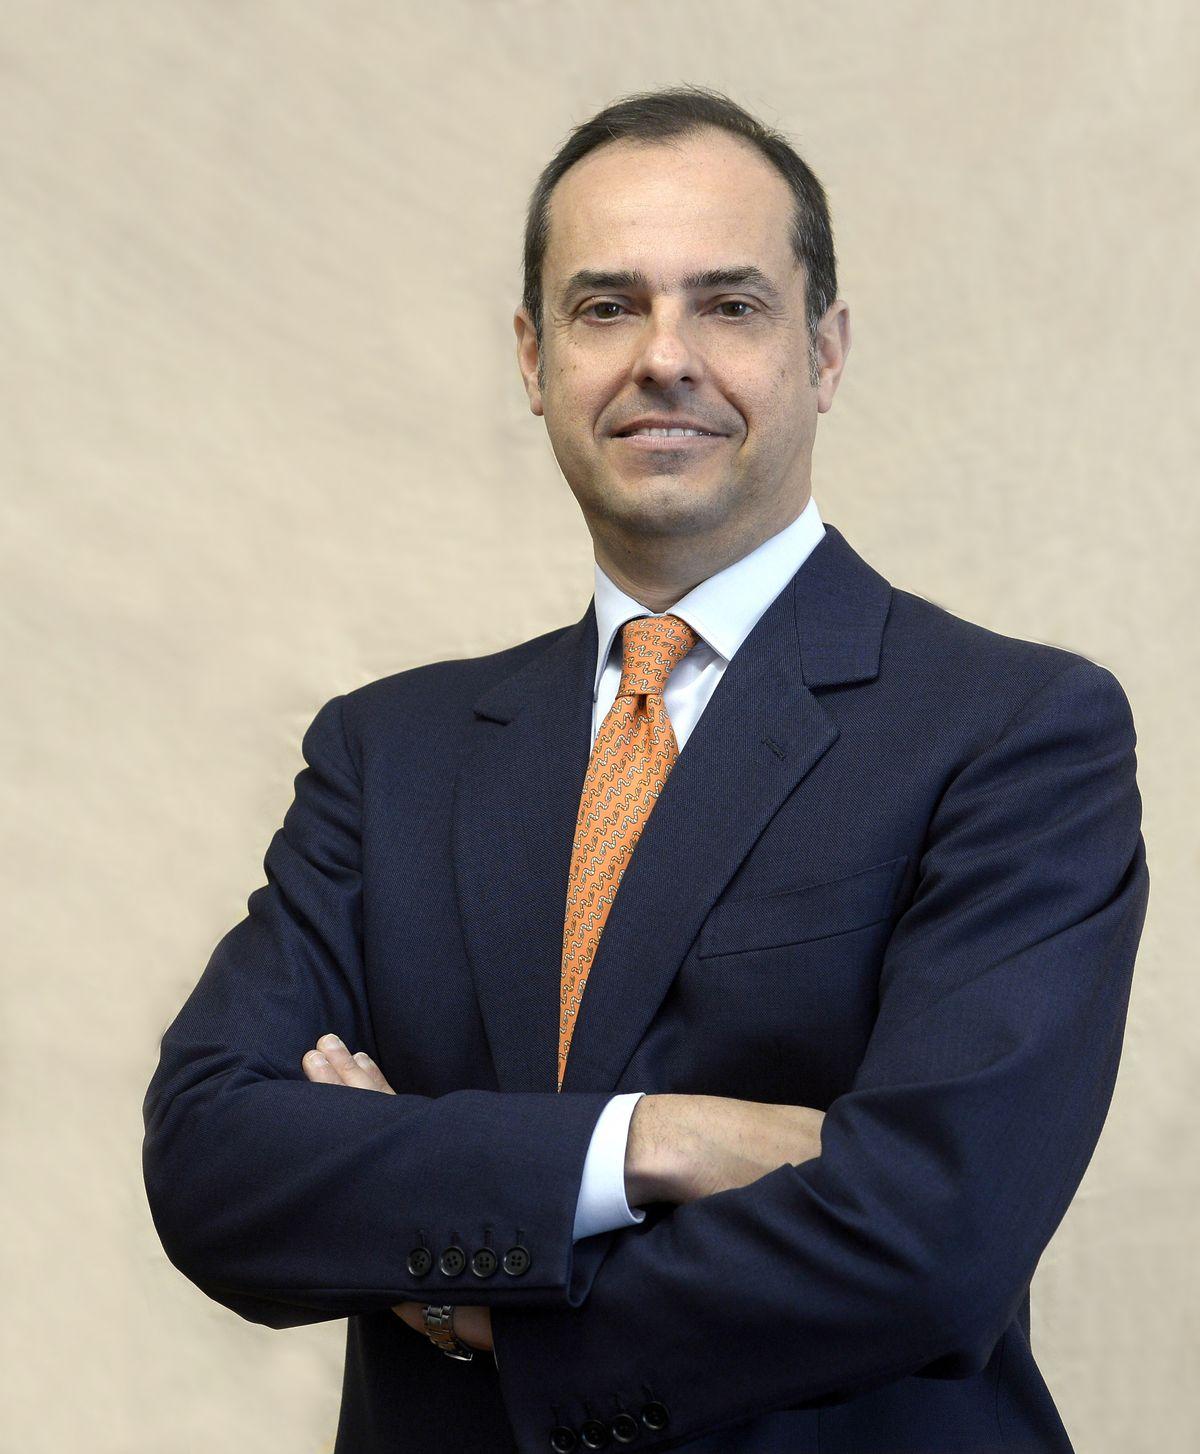 Paolo Roberti